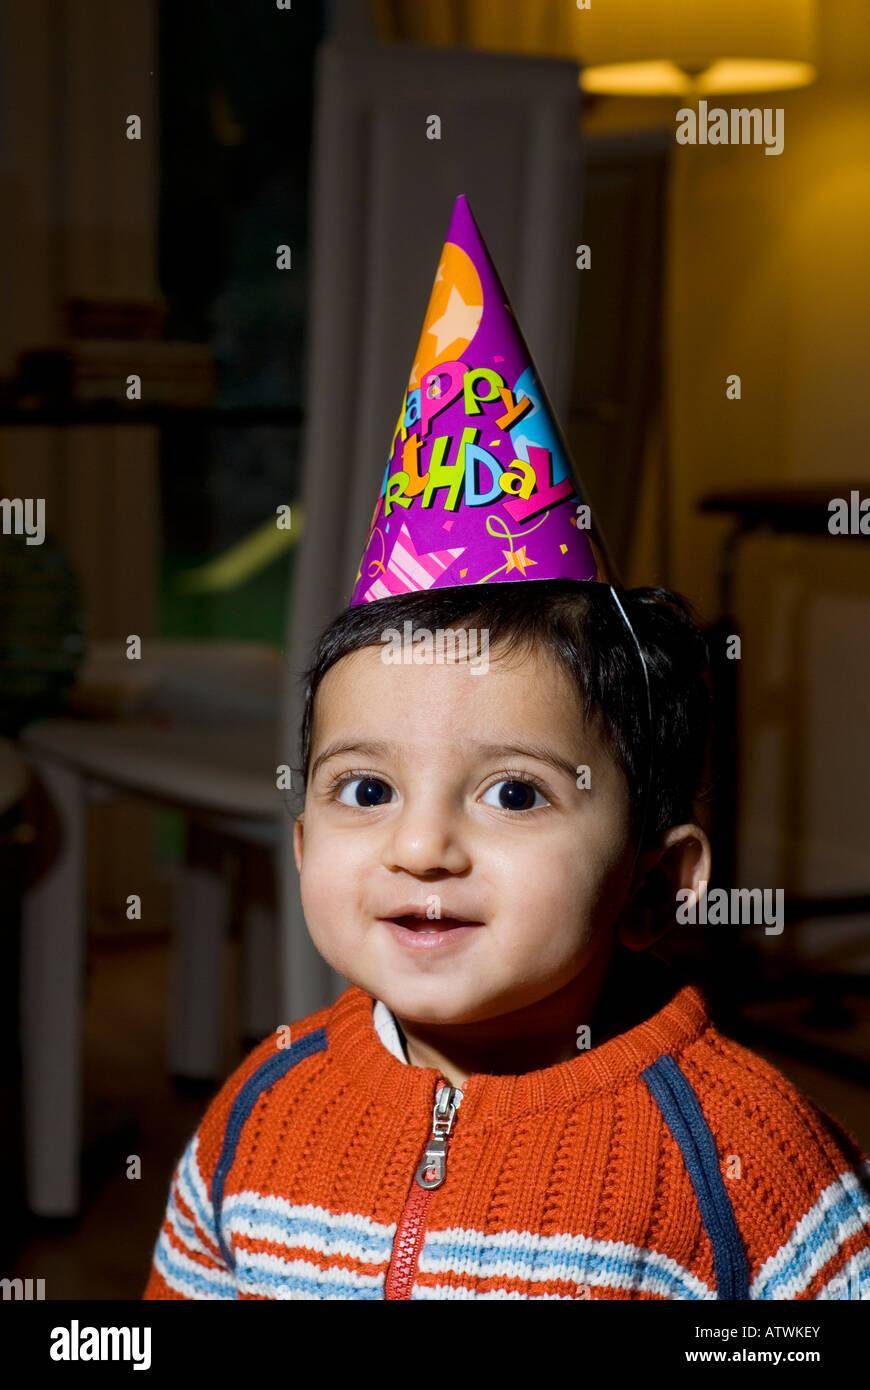 One Year Old Baby Boy Wearing Happy Birthday Cone Hat Stock Photo Alamy